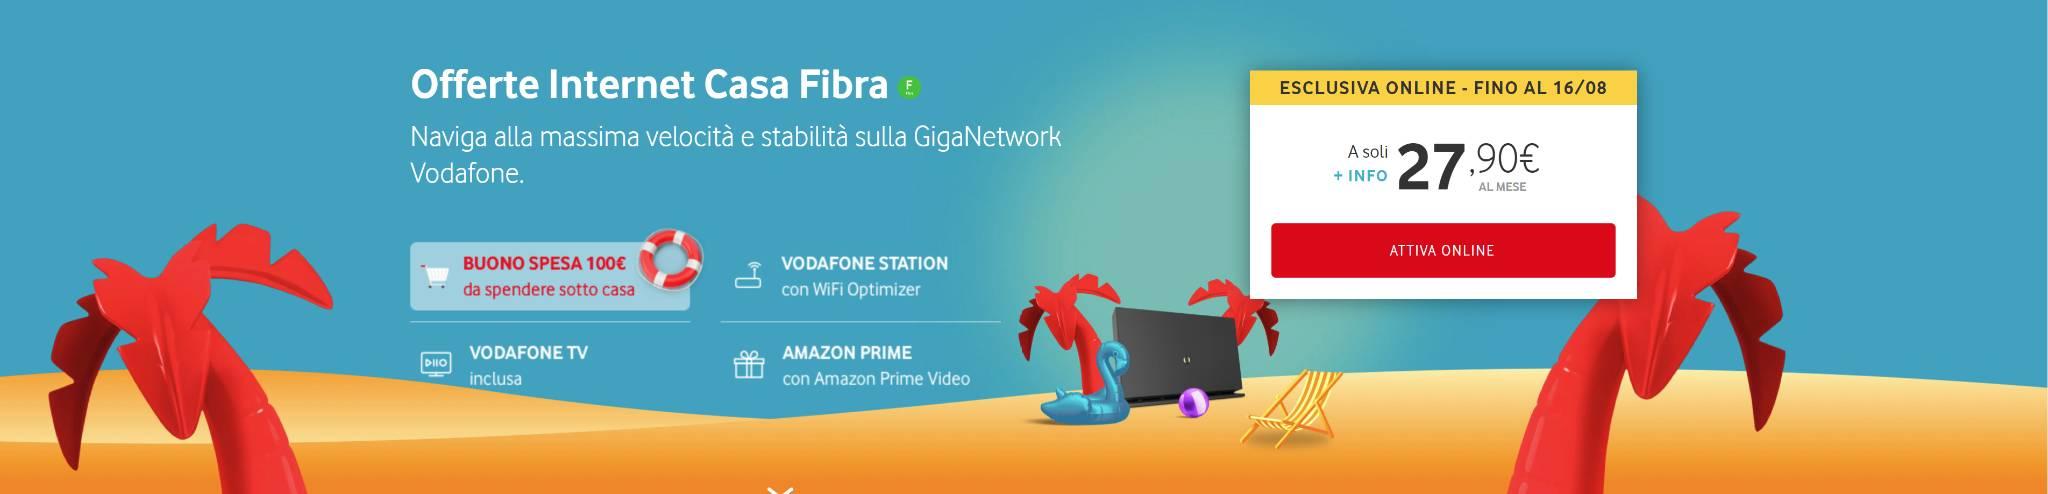 offerta vodafone unlimited fibra